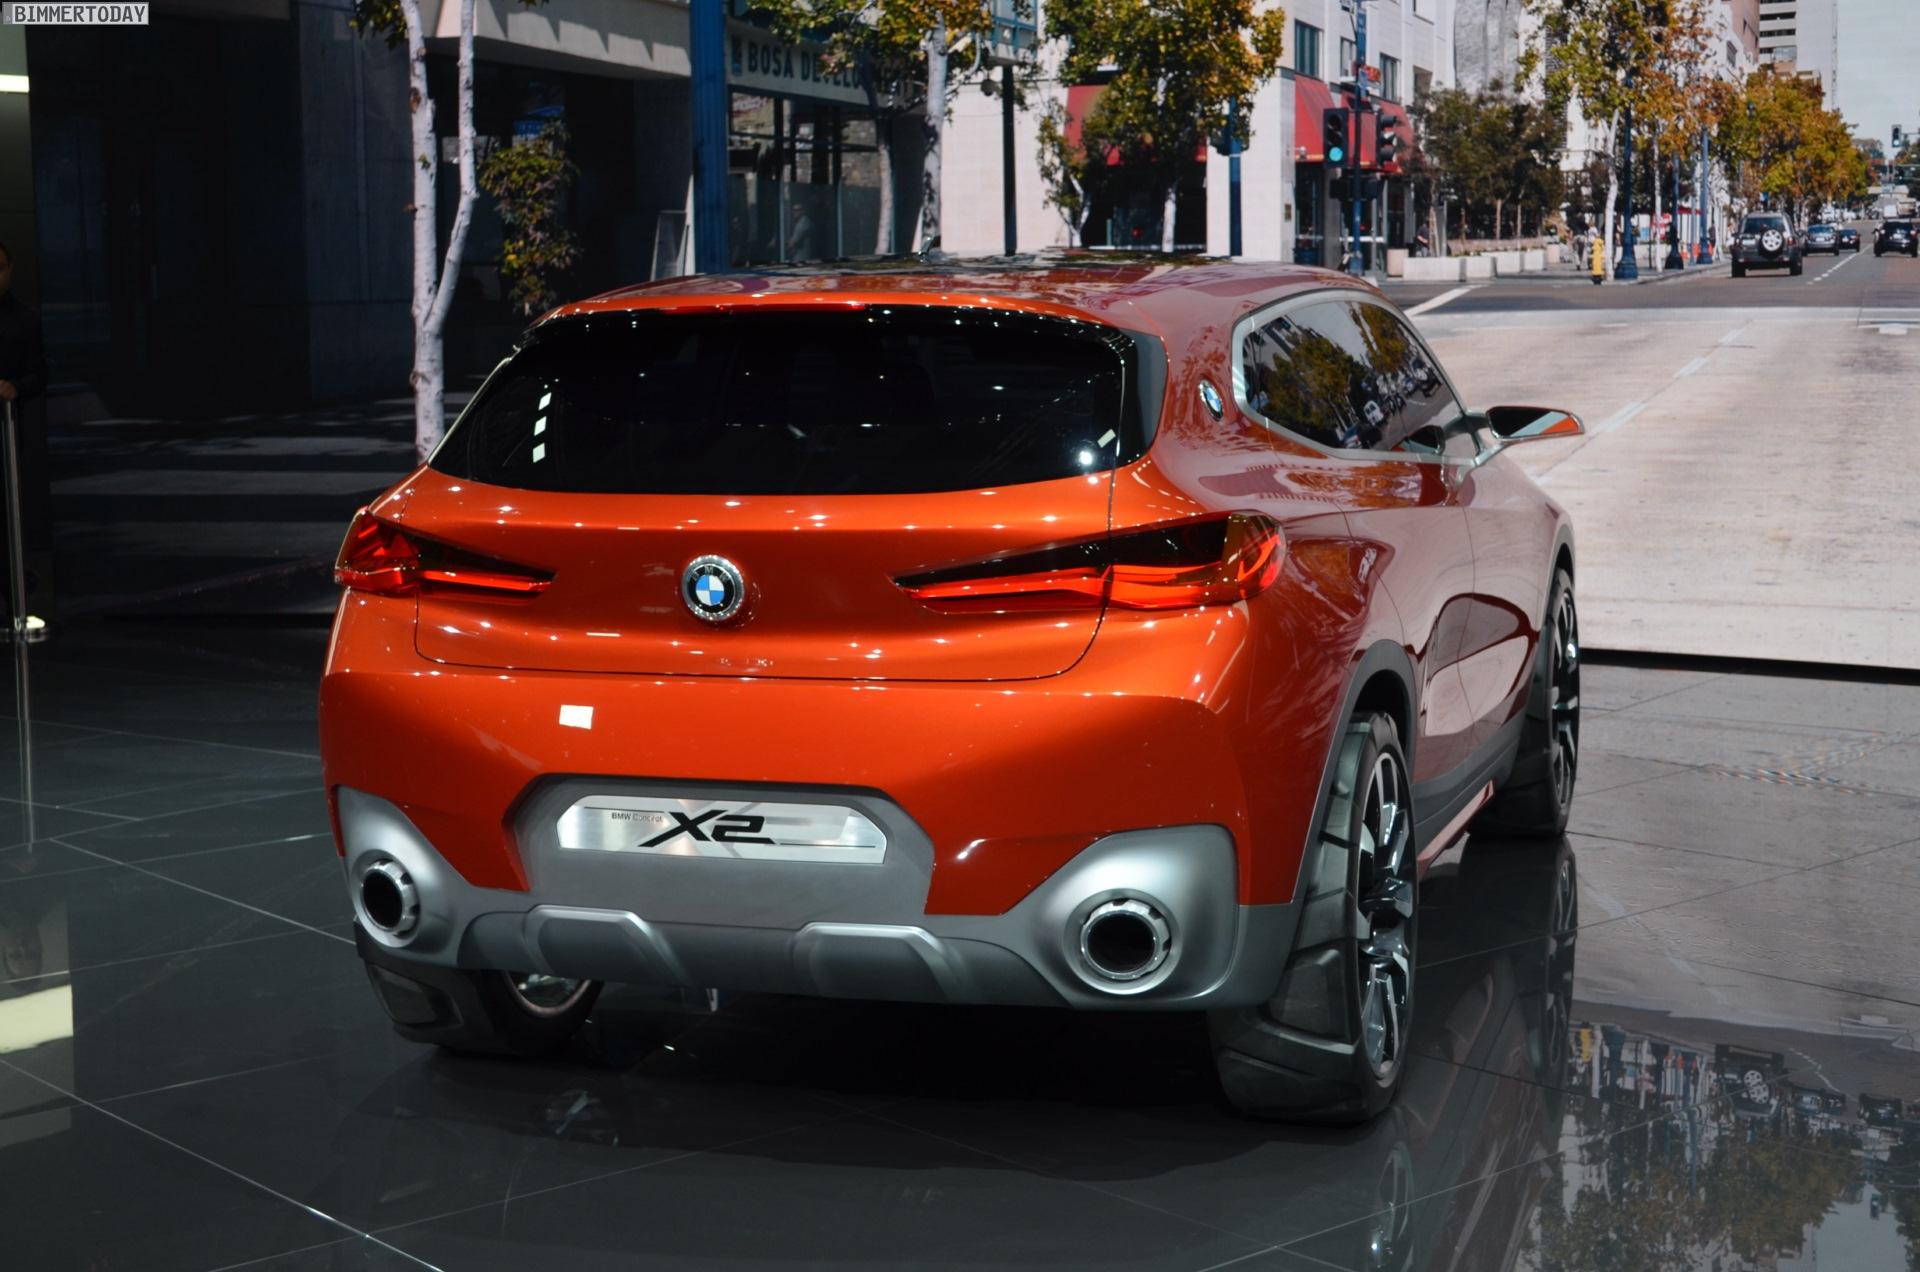 Bmw X2 2017 Price >> Paris 2016: BMW X2 Concept LIVE PHOTOS